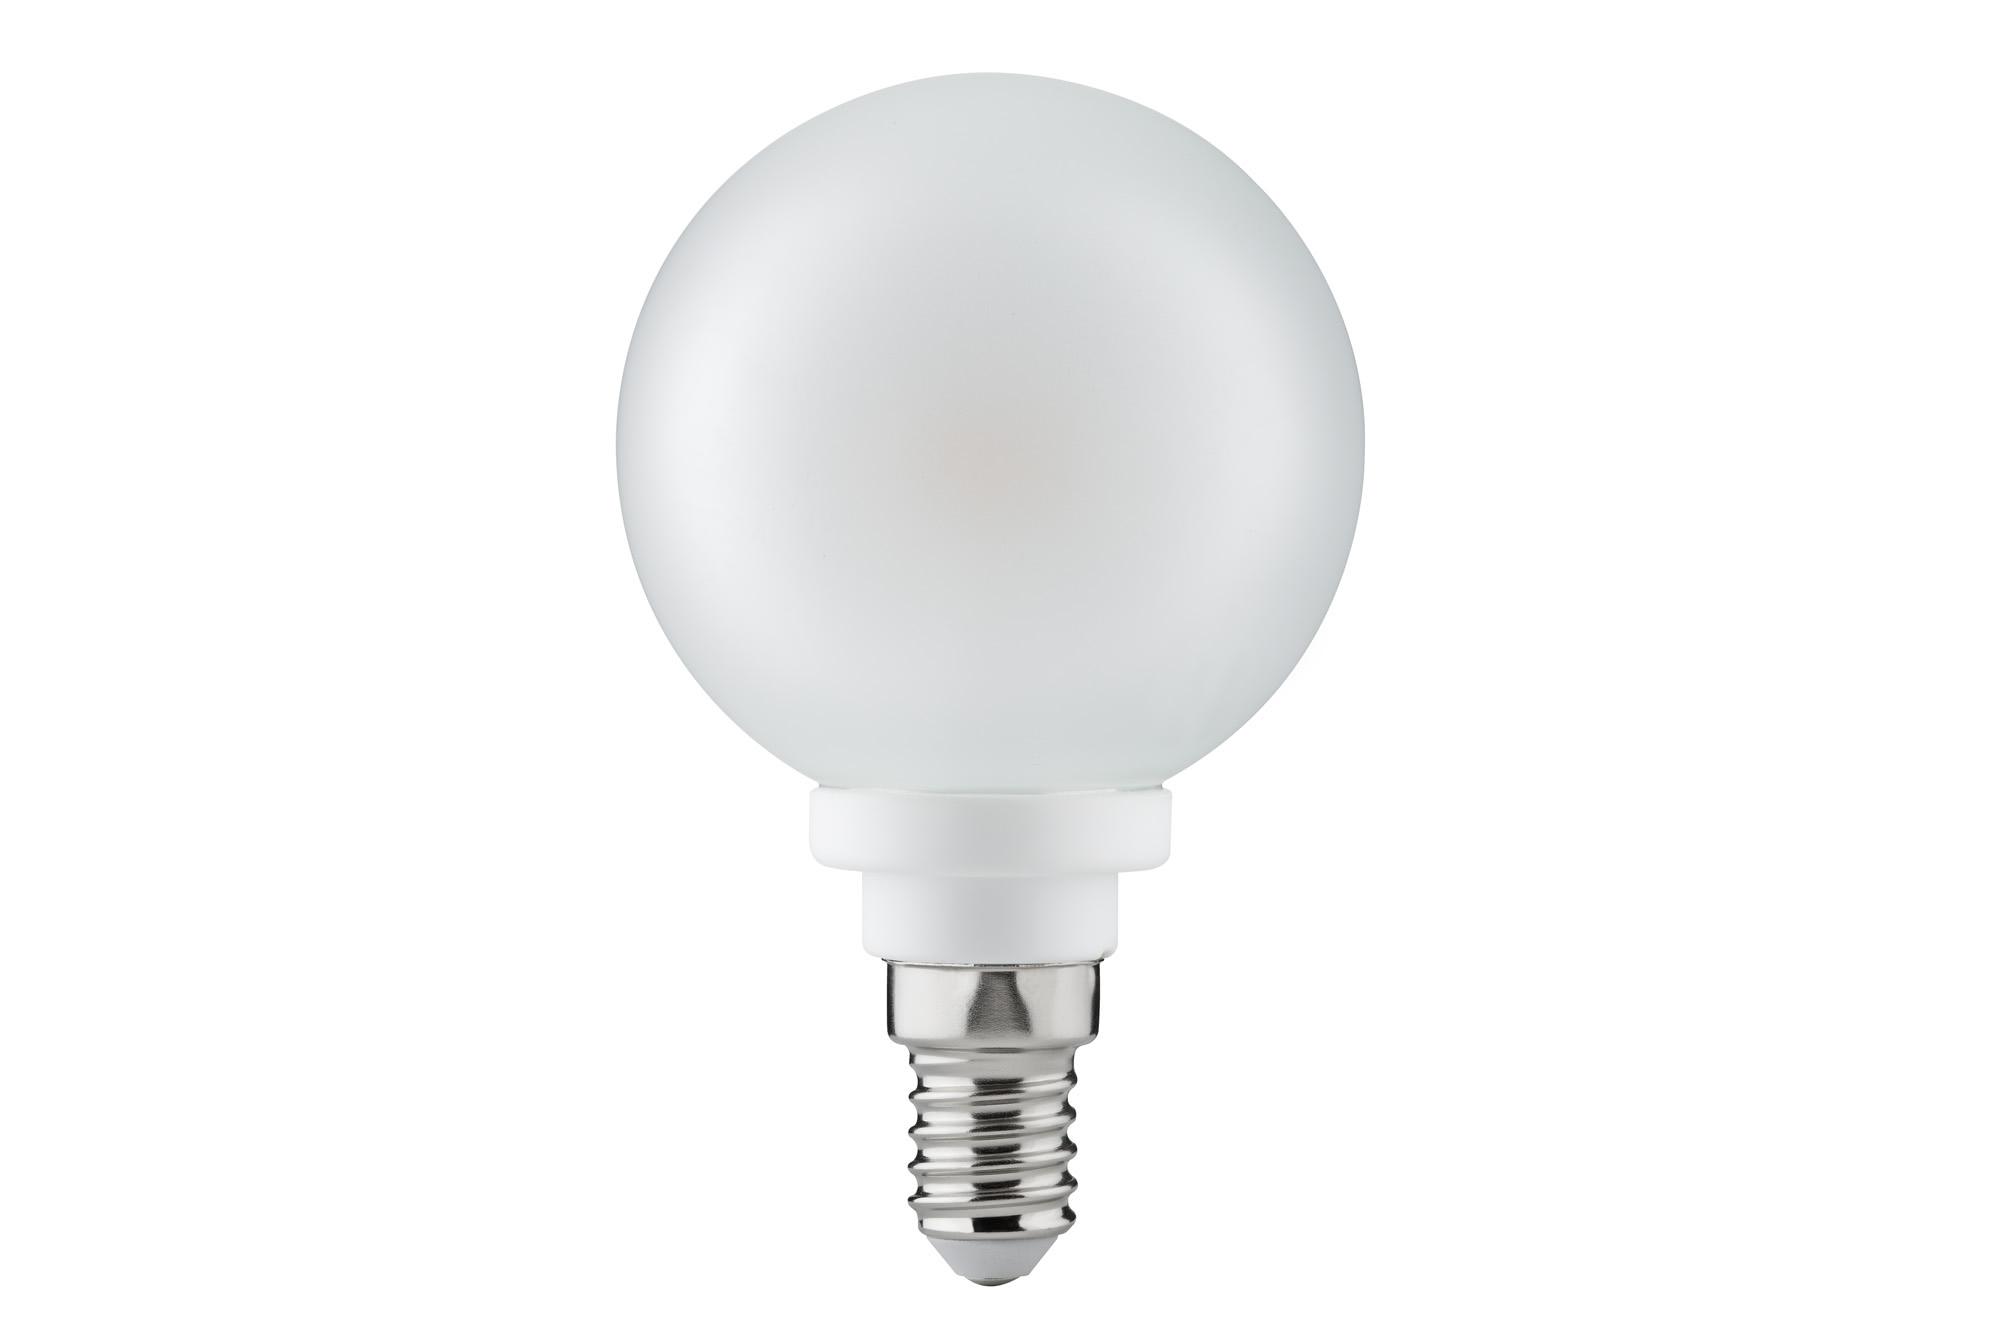 Paulmann. 28324 LED Globe 60 4W E14 Sat 2700K